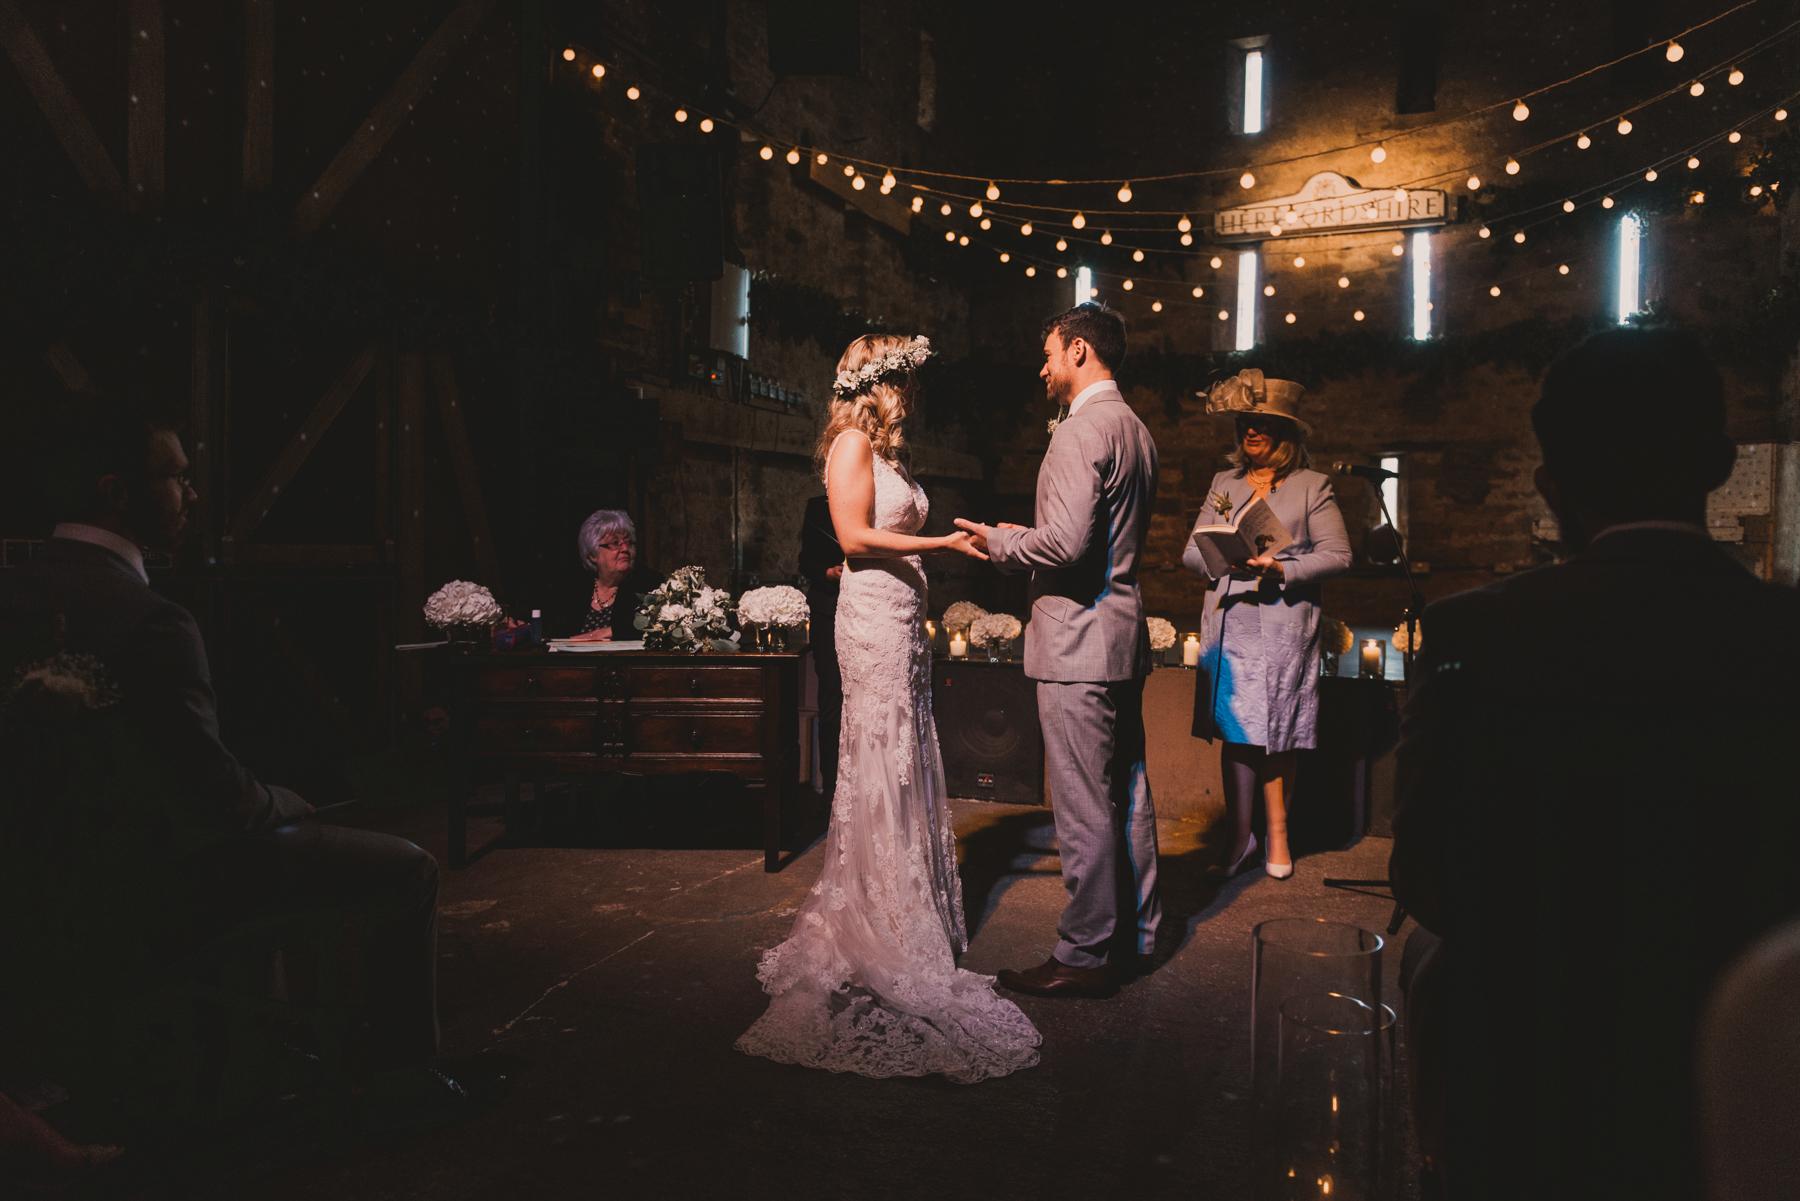 Herefordshire-barn-wedding-highlights-051.jpg